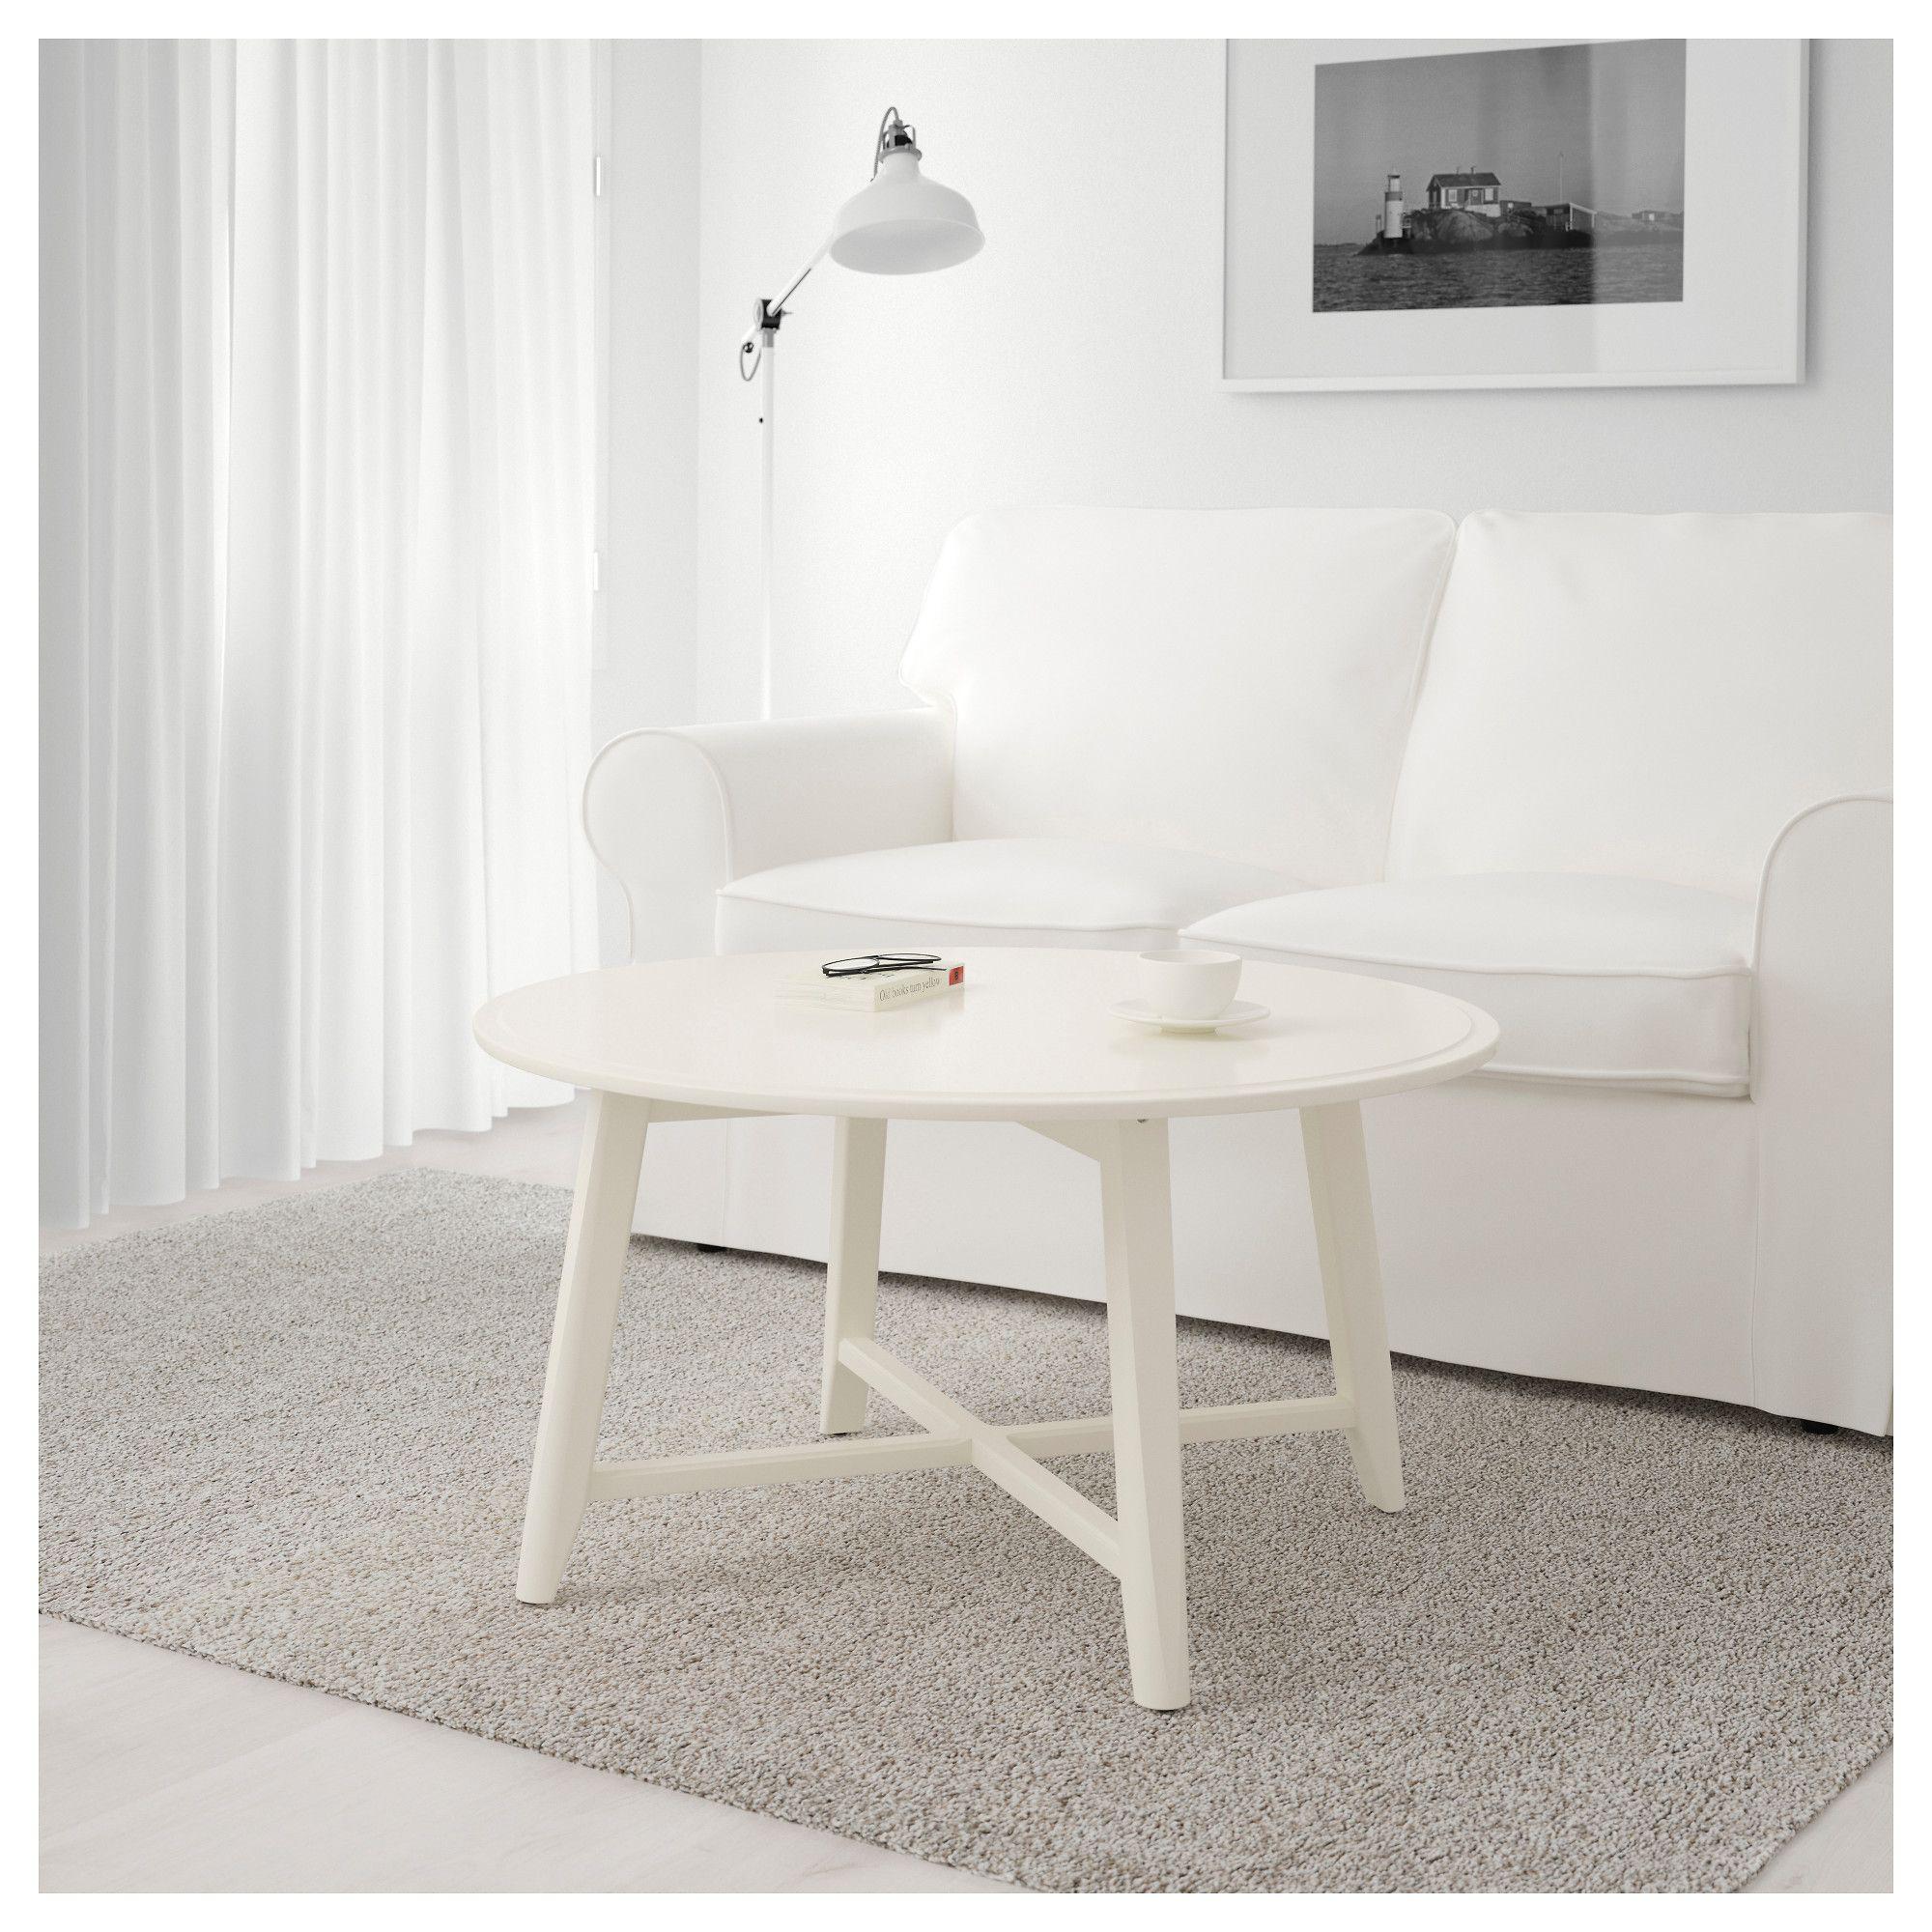 KRAGSTA white, Coffee table, 90 cm IKEA Coffee table